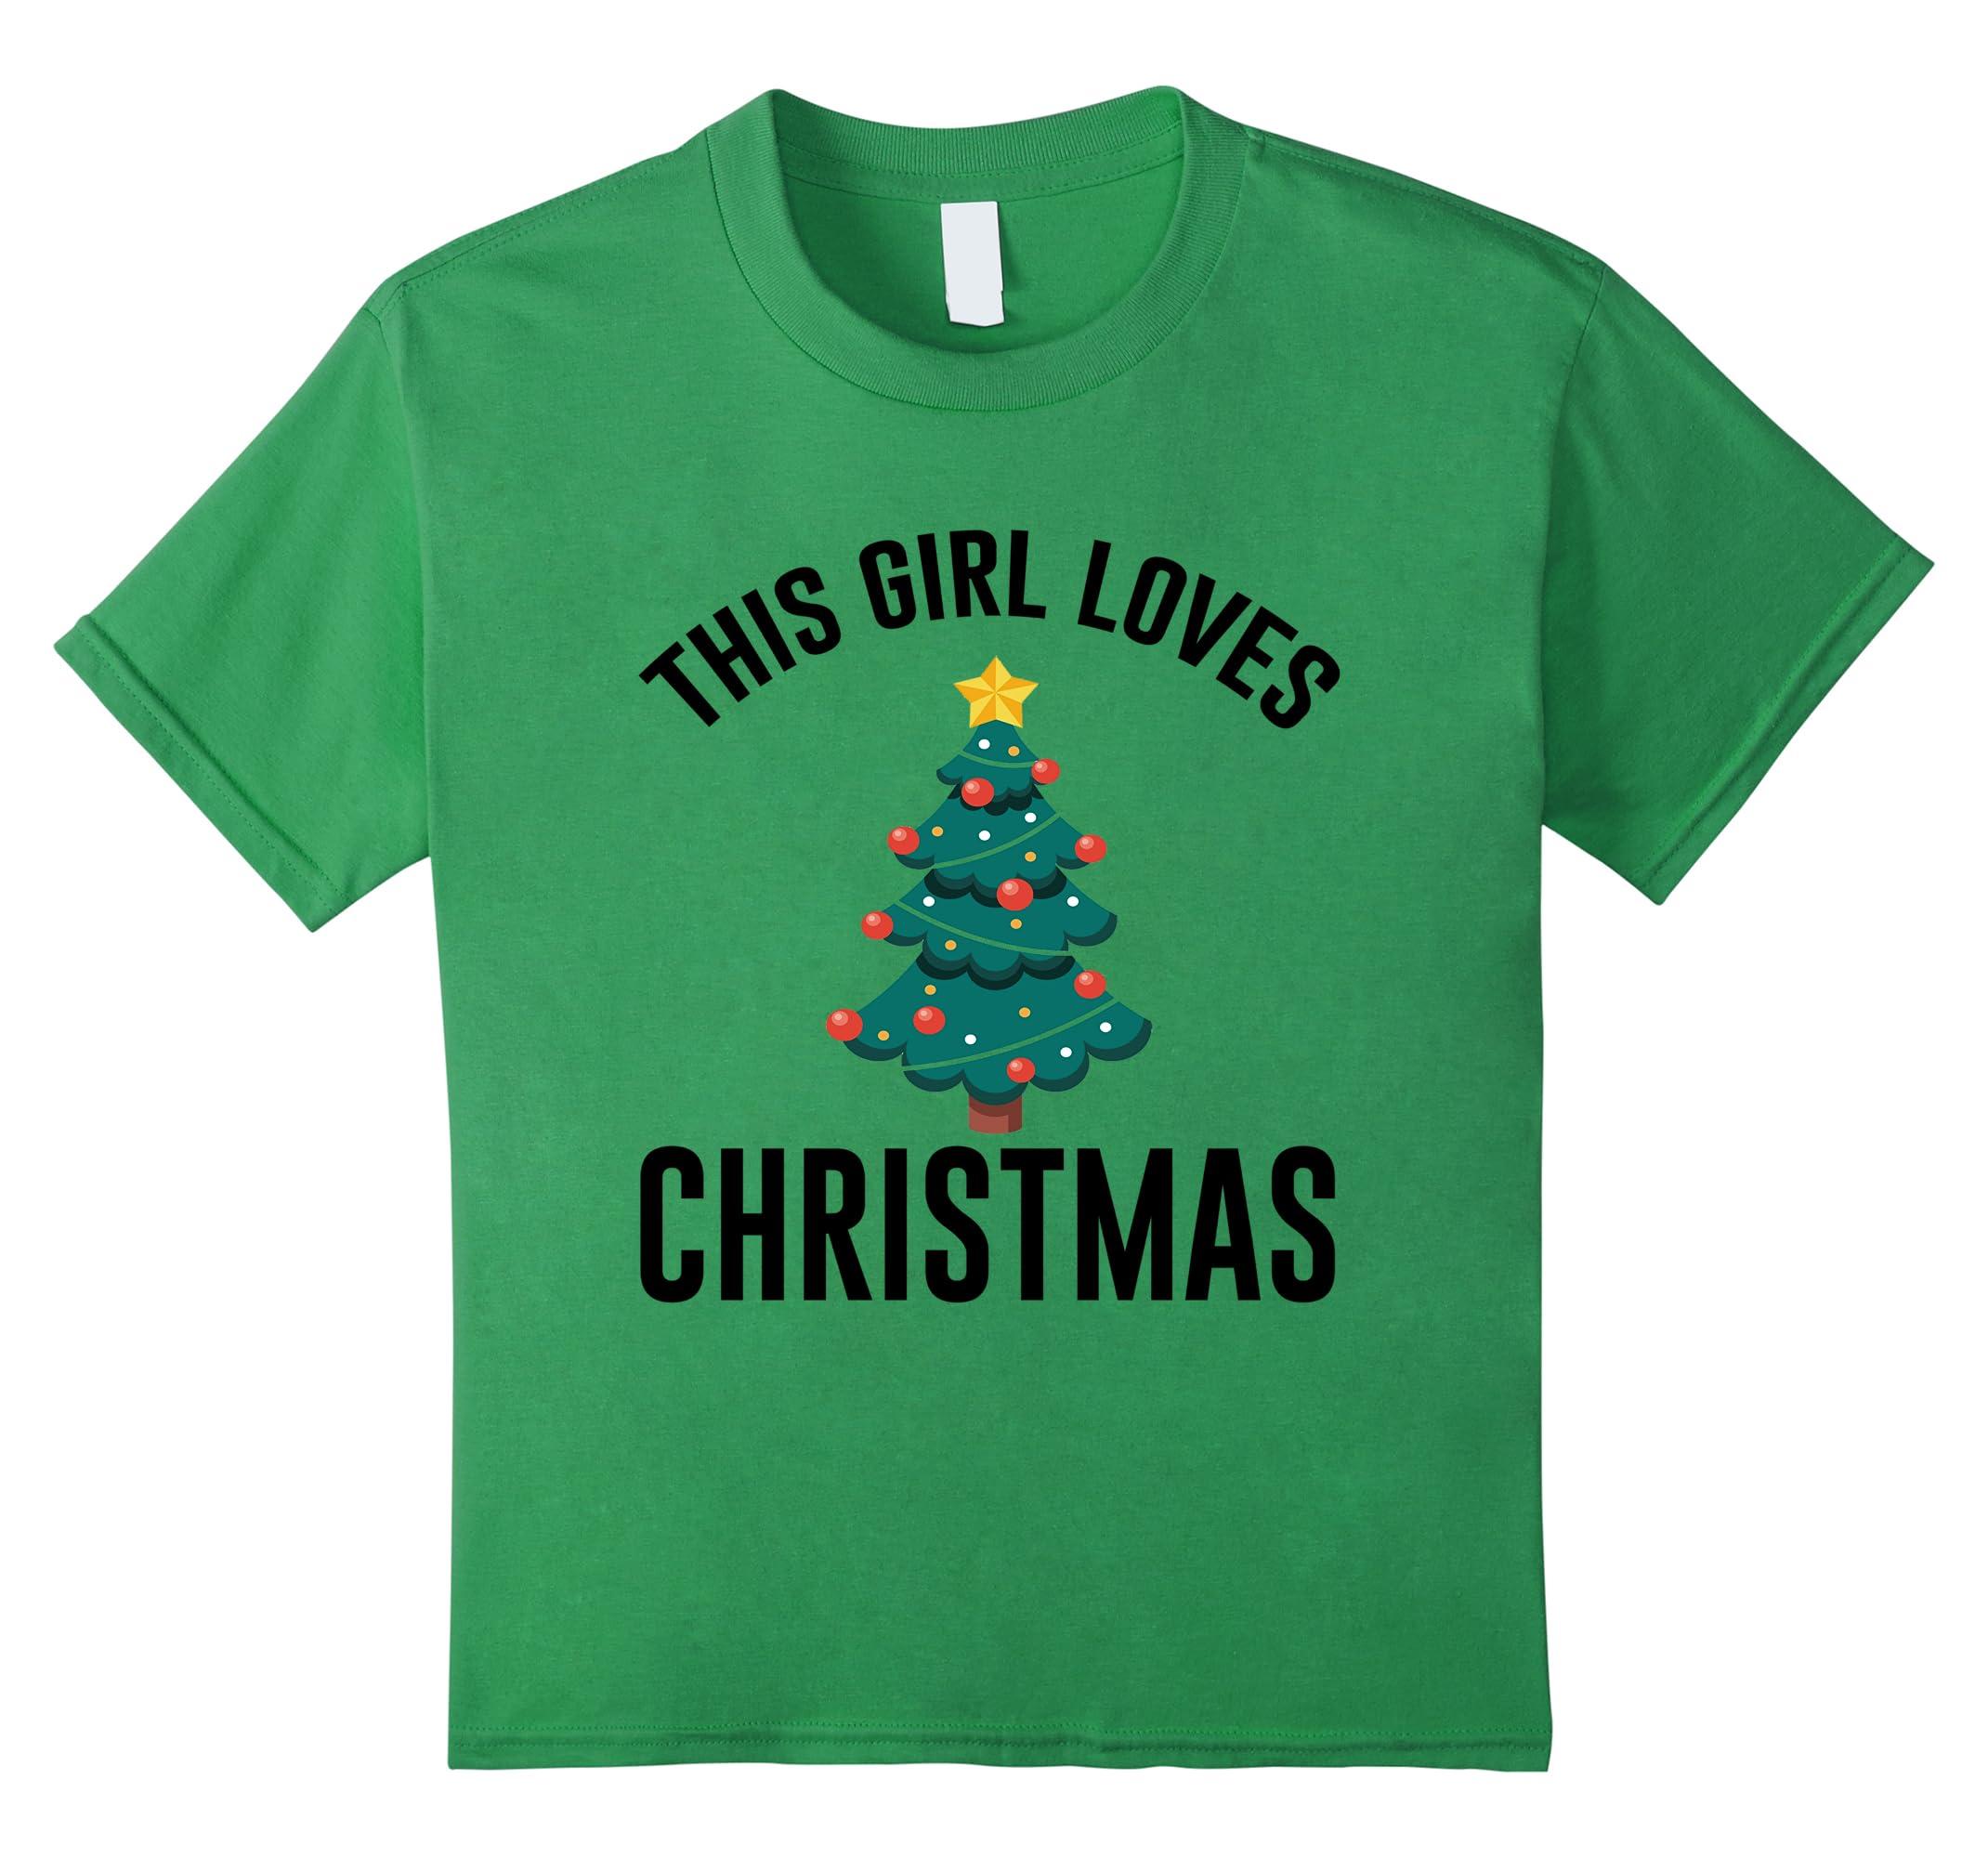 This Girl Loves Christmas T shirt